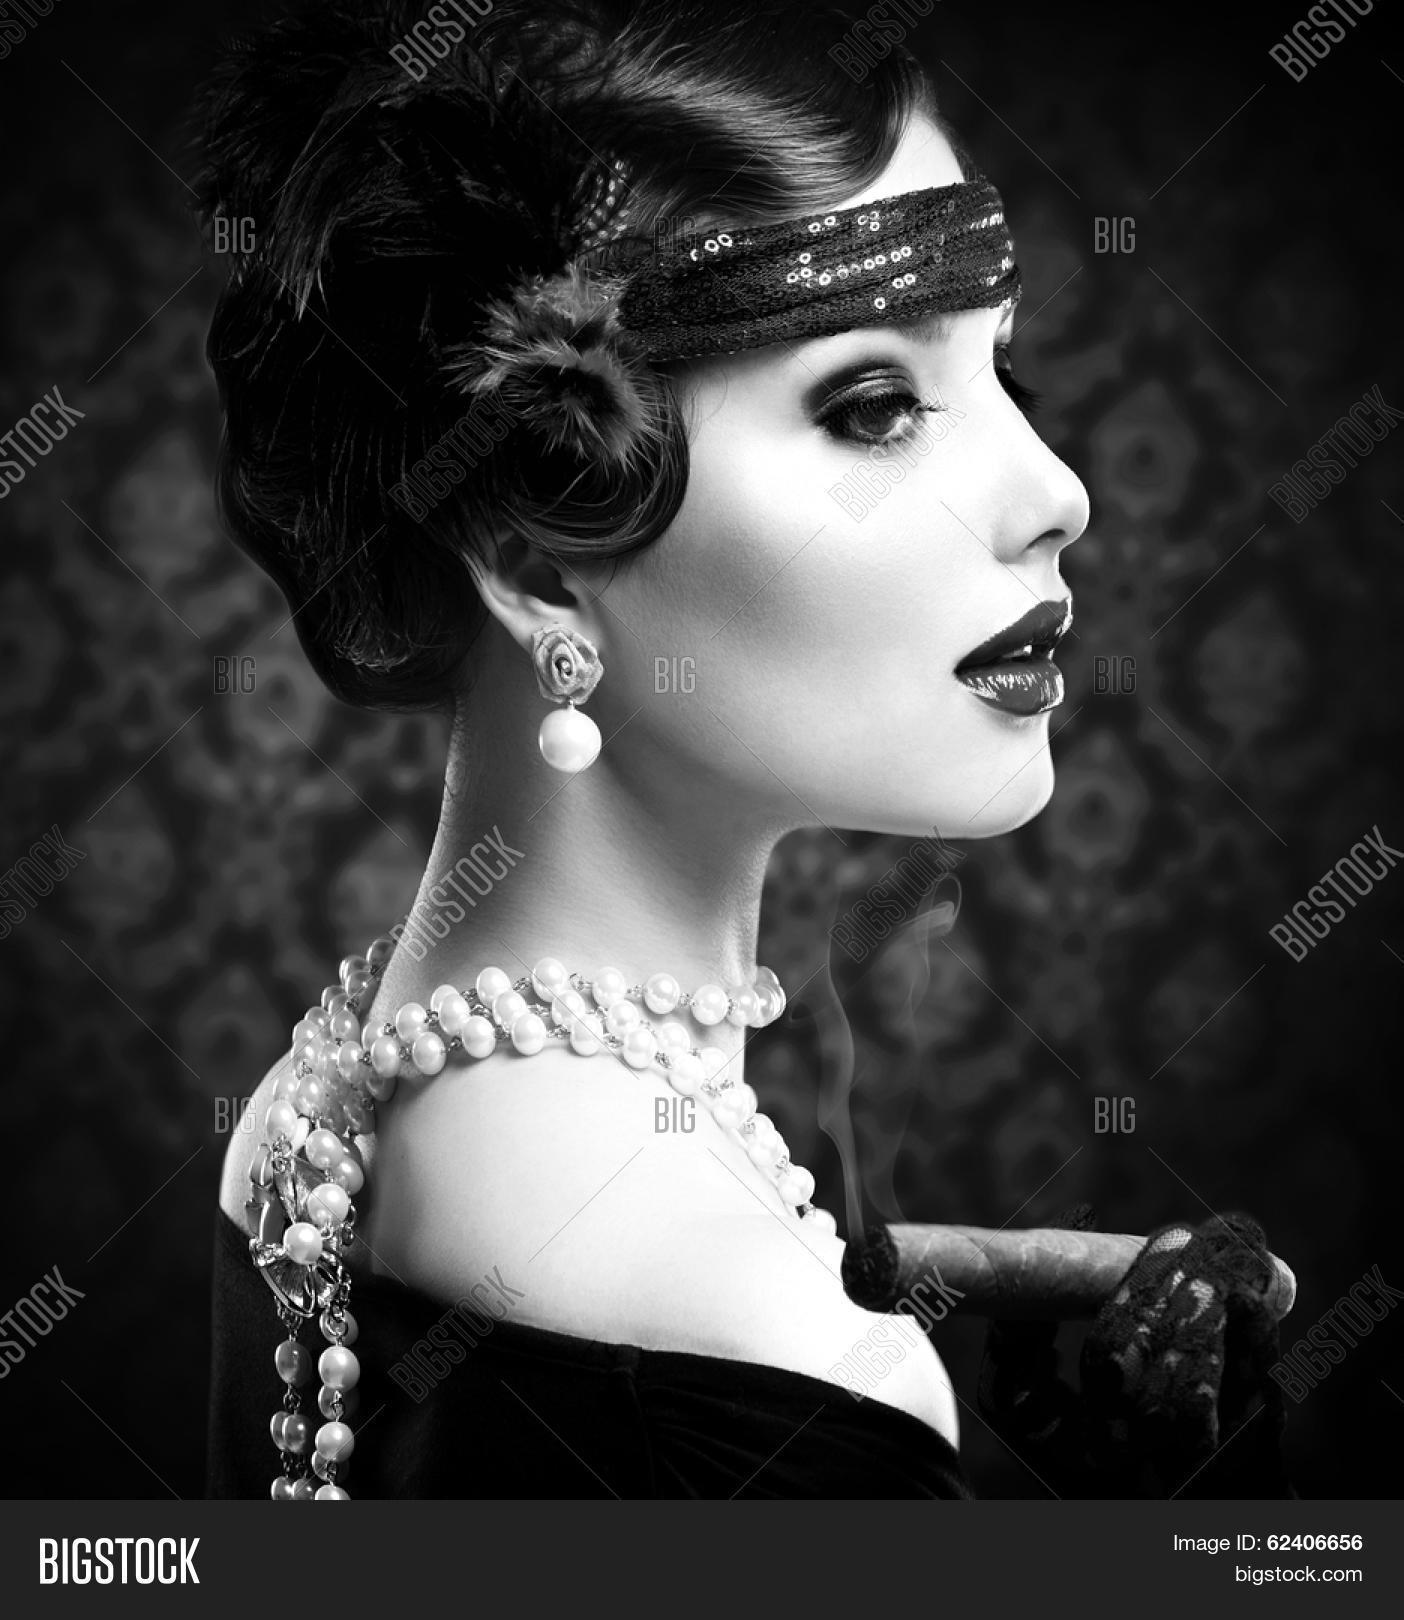 Retro woman portrait image photo free trial bigstock